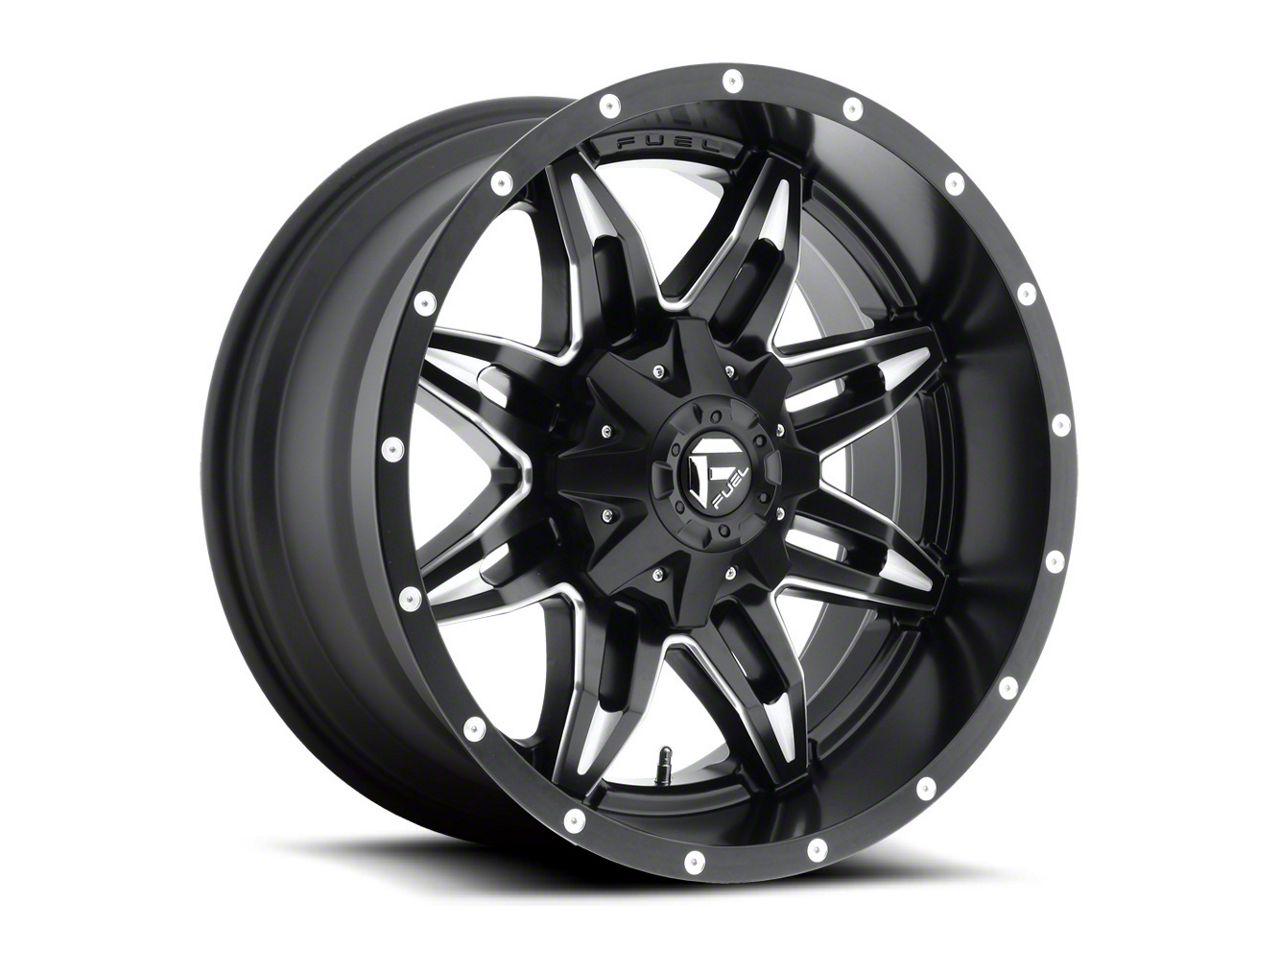 Fuel Wheels Lethal Black Milled 6-Lug Wheel - 20x12 (99-18 Silverado 1500)